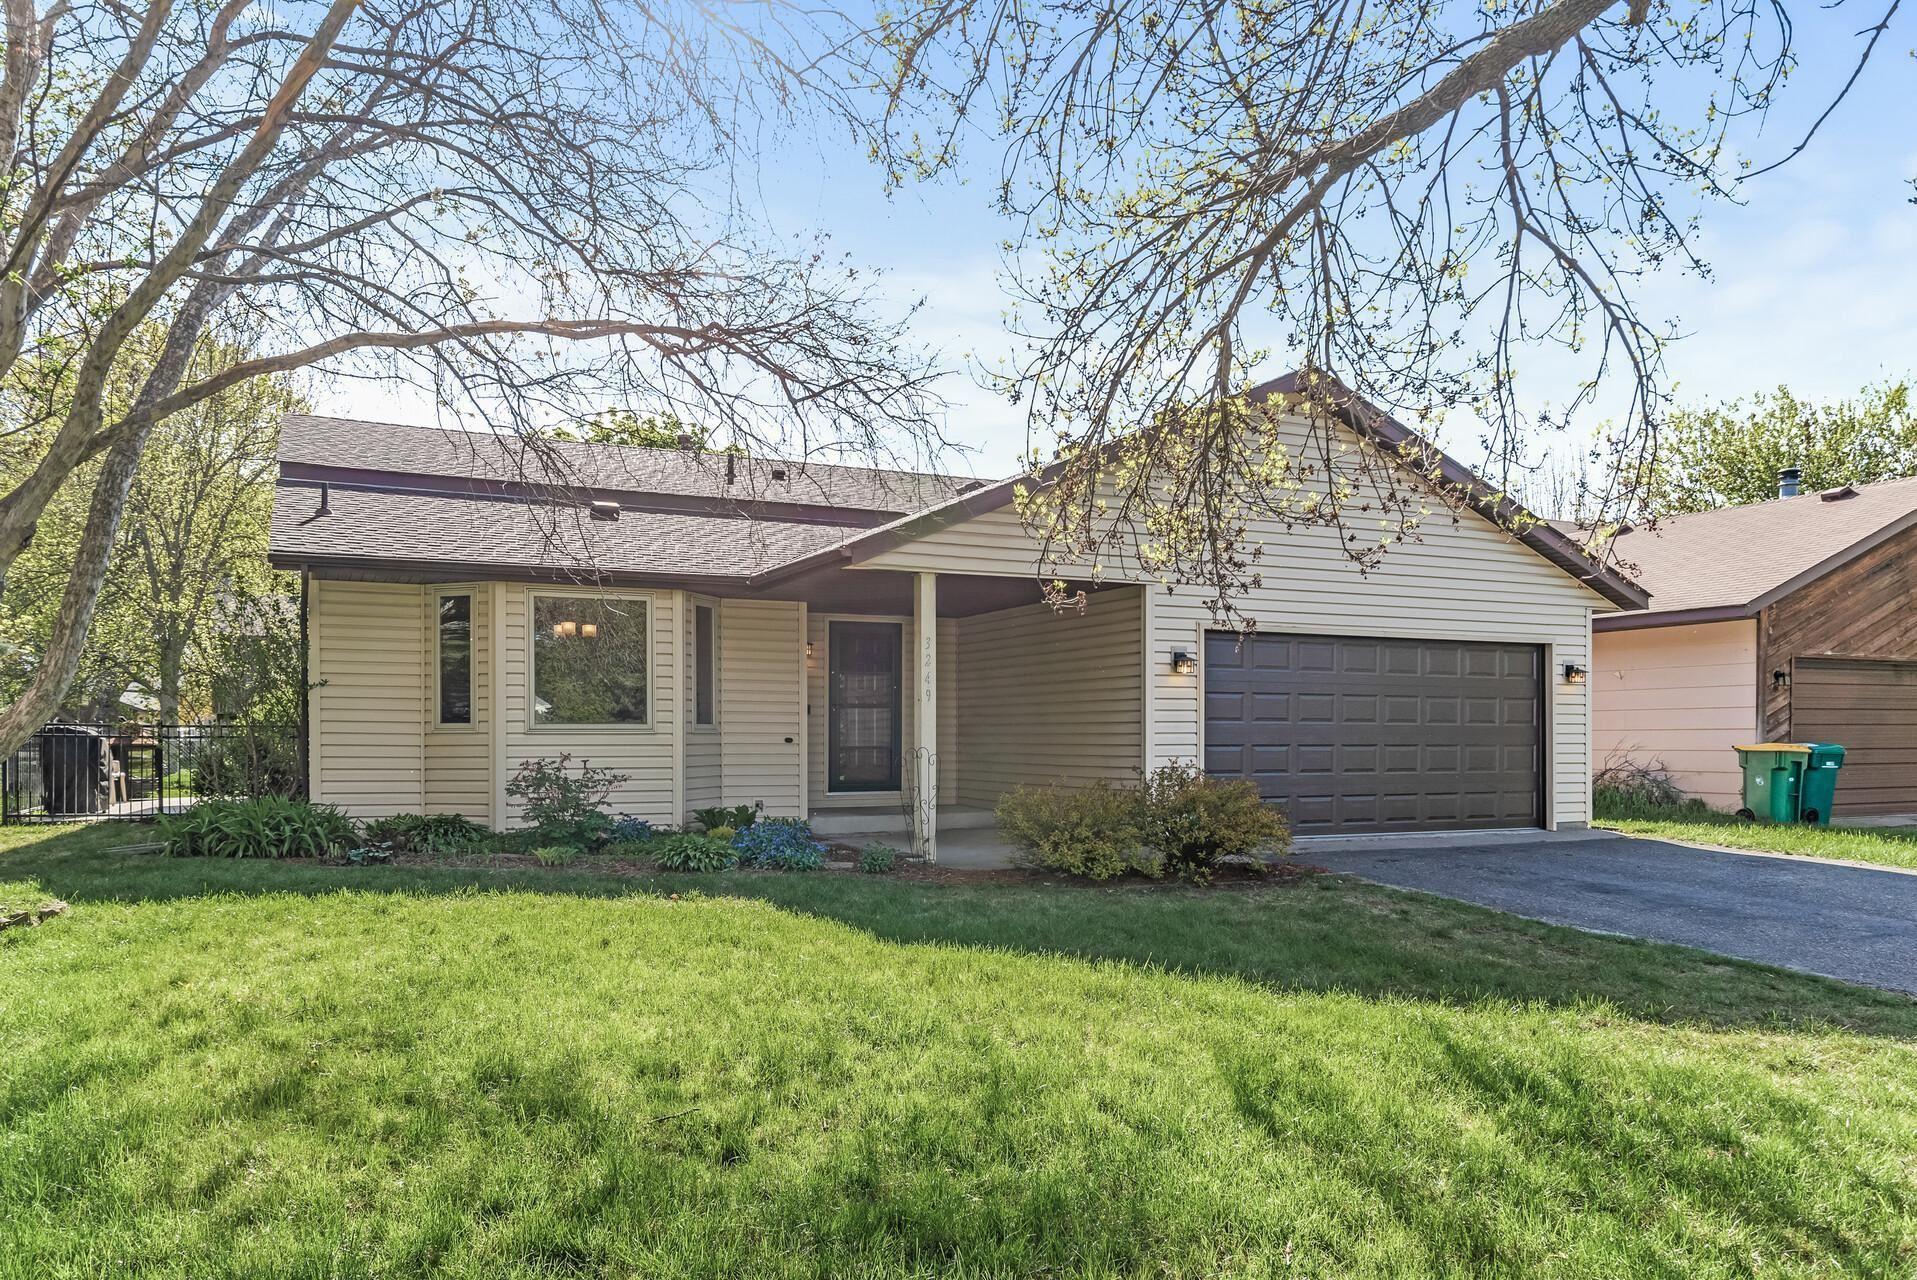 3249 Ridgewood Avenue, Vadnais Heights, MN 55127 - MLS#: 5742229